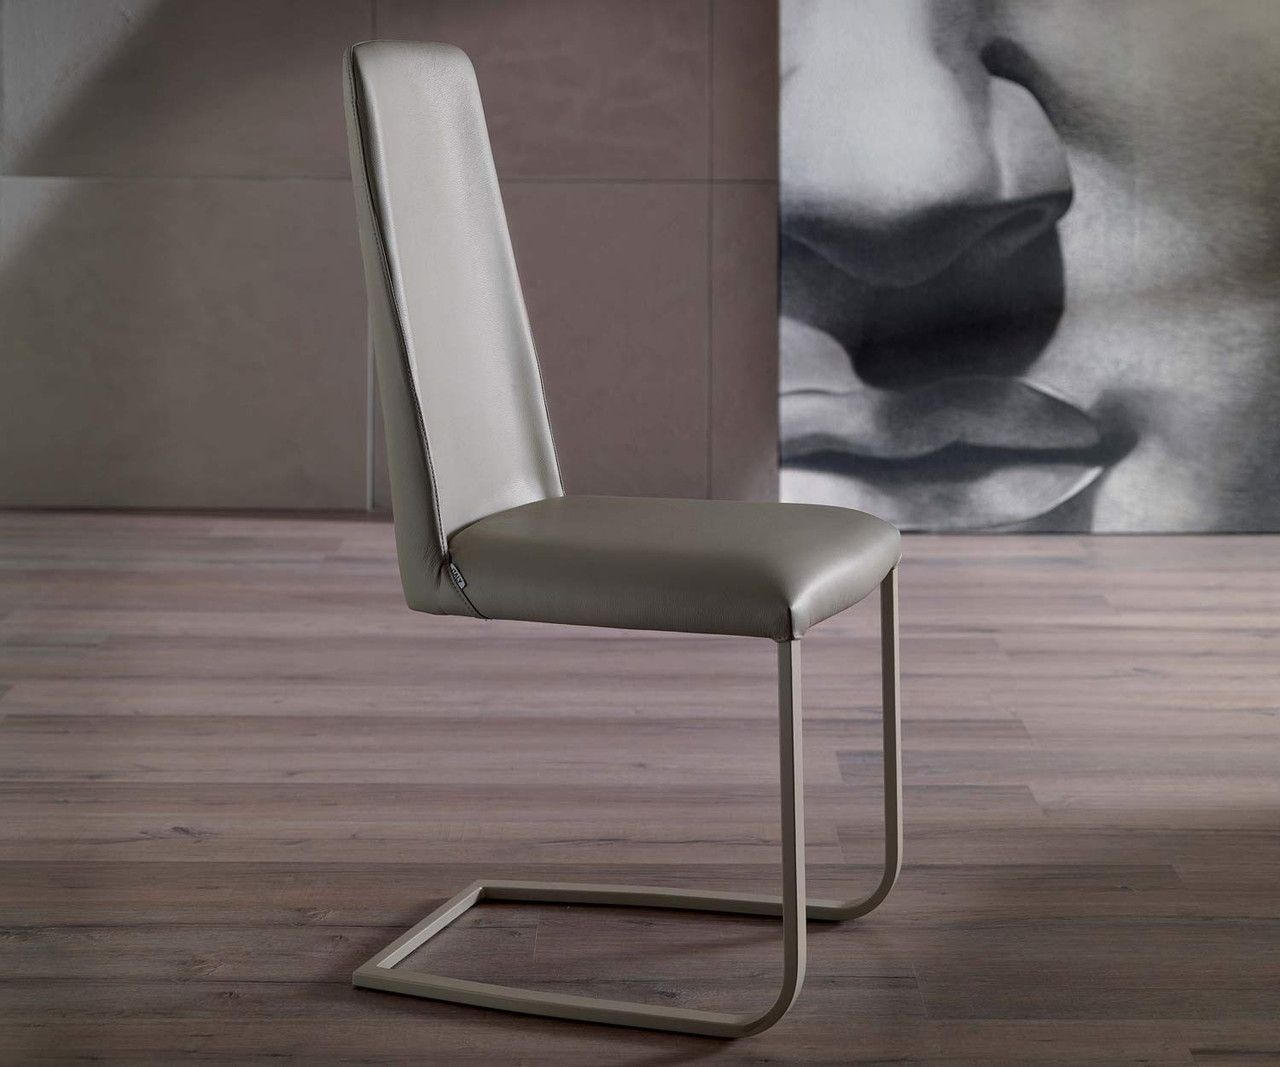 Ozze Stuhl Chair Furniture Home Decor Home